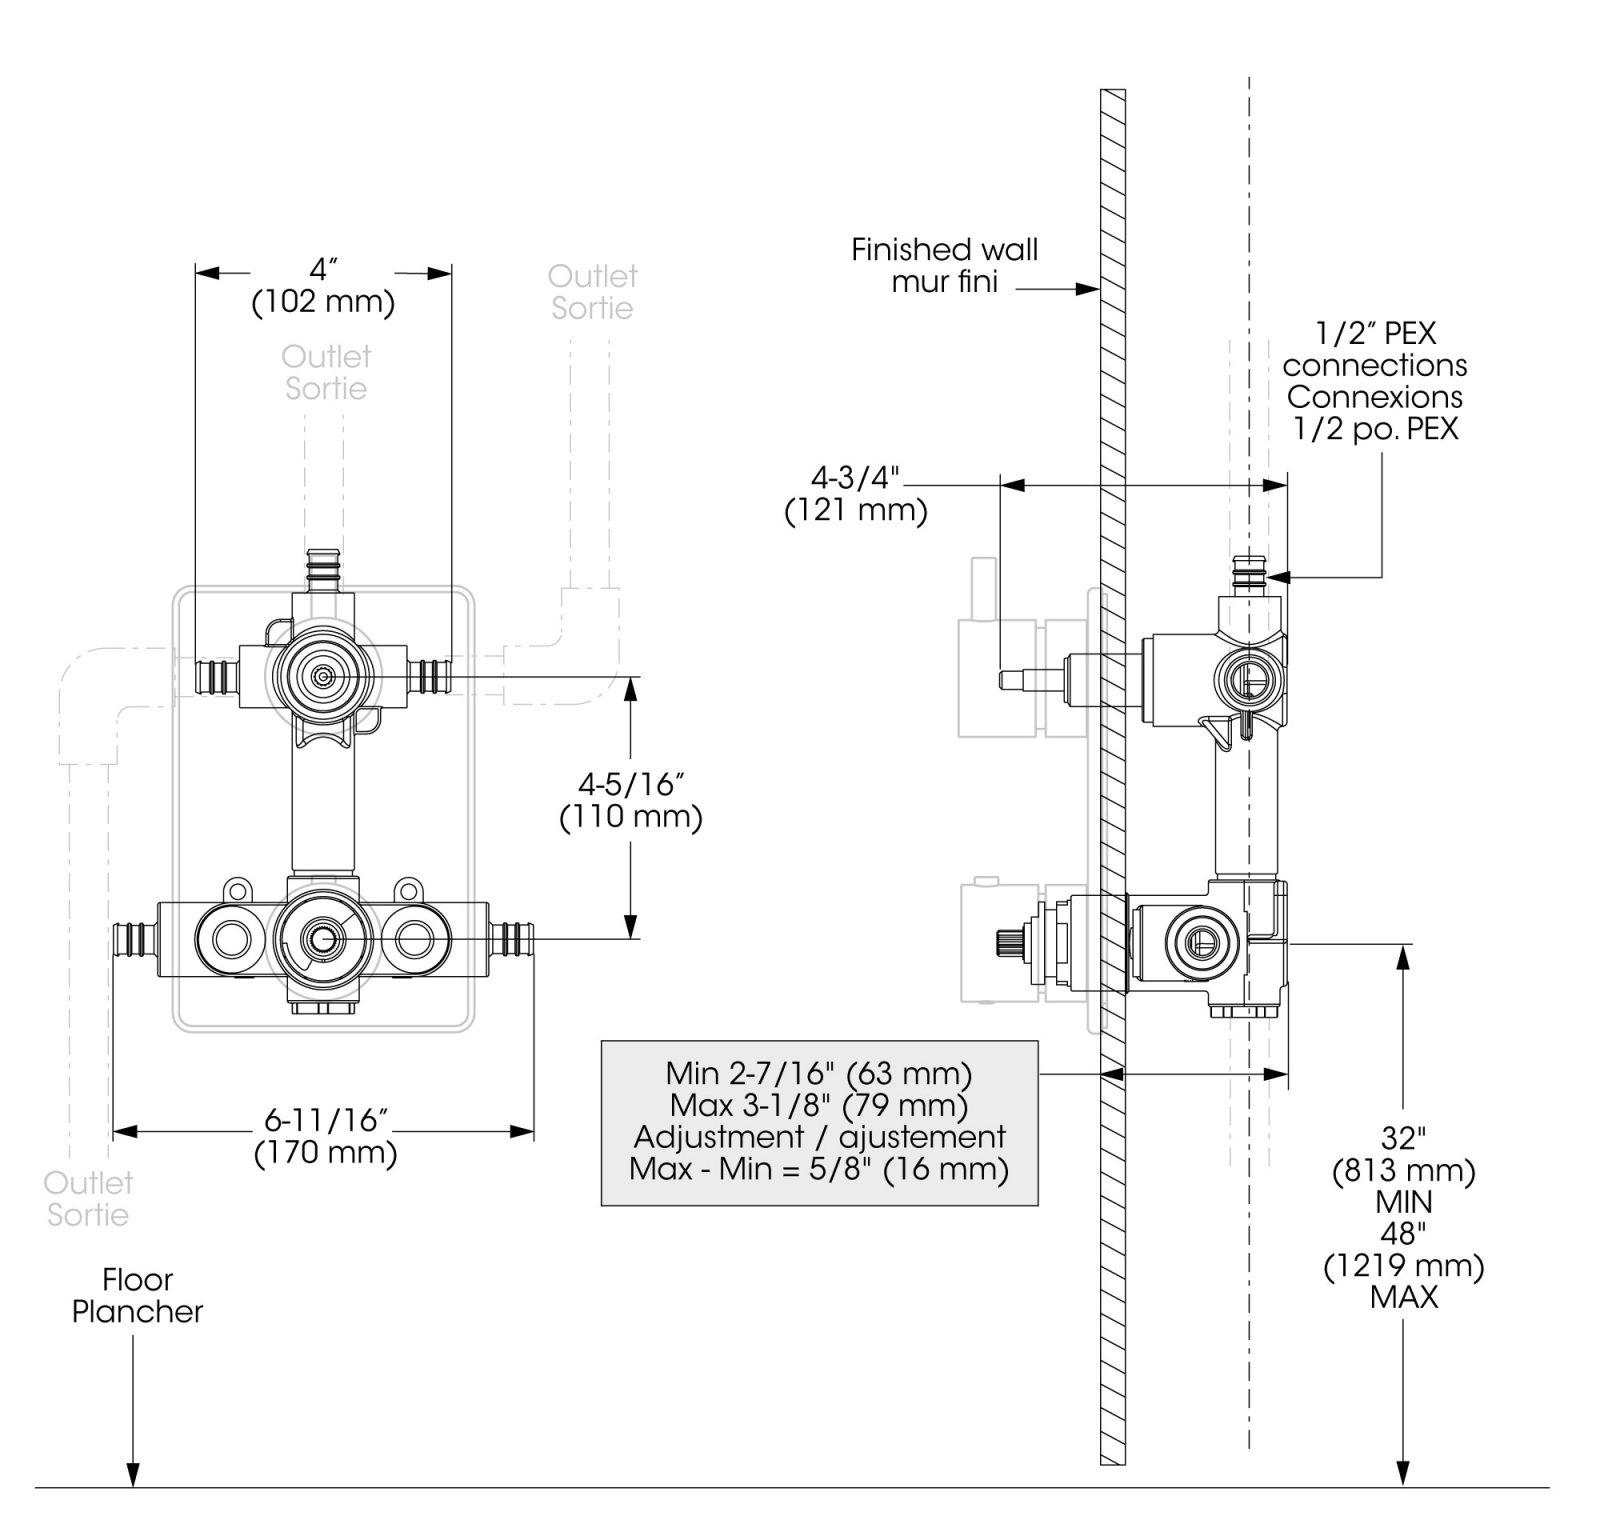 hight resolution of honeywell rm7840l1018 wiring diagram honeywell switching relay wiring diagram inspirational honeywell l8148a wiring diagram wiring